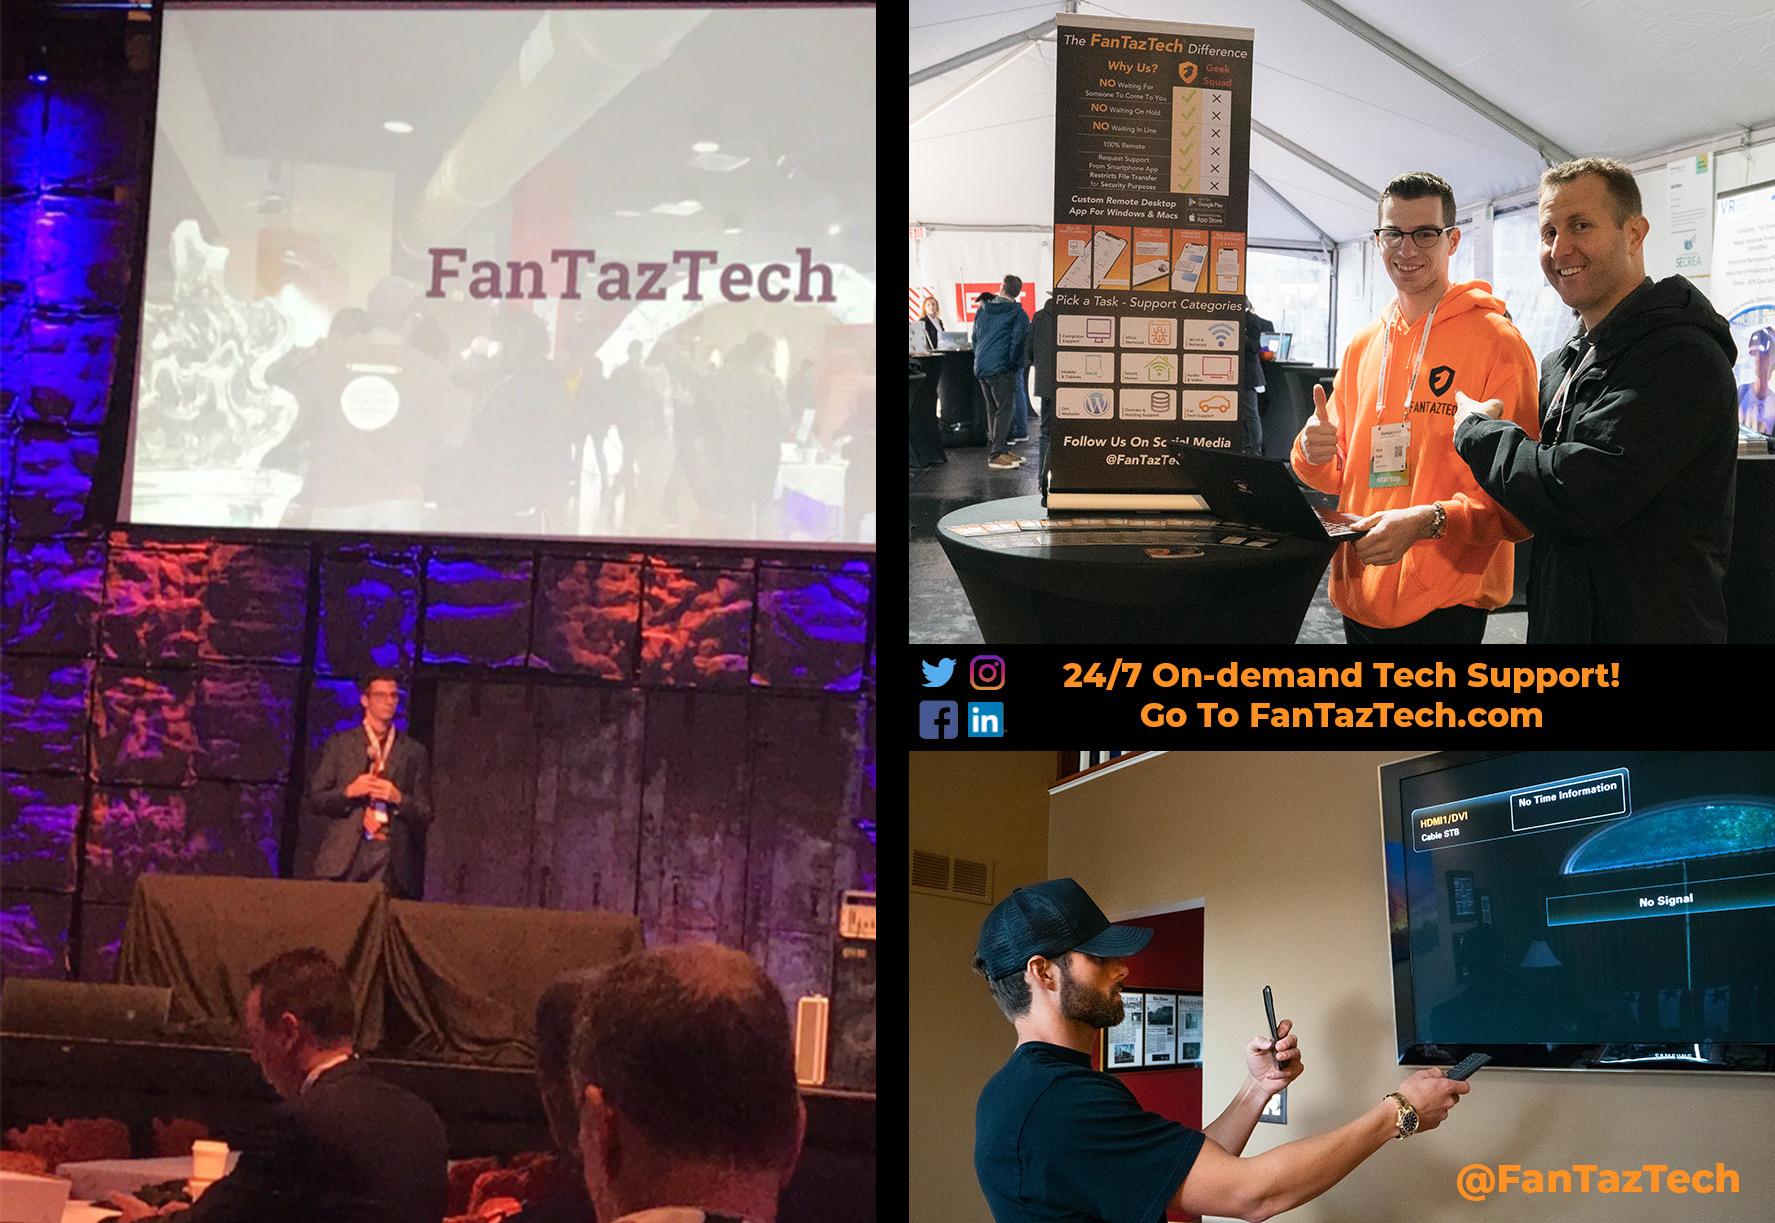 How Nick Peist & FanTazTech Flipped The IT Industry Upside Down